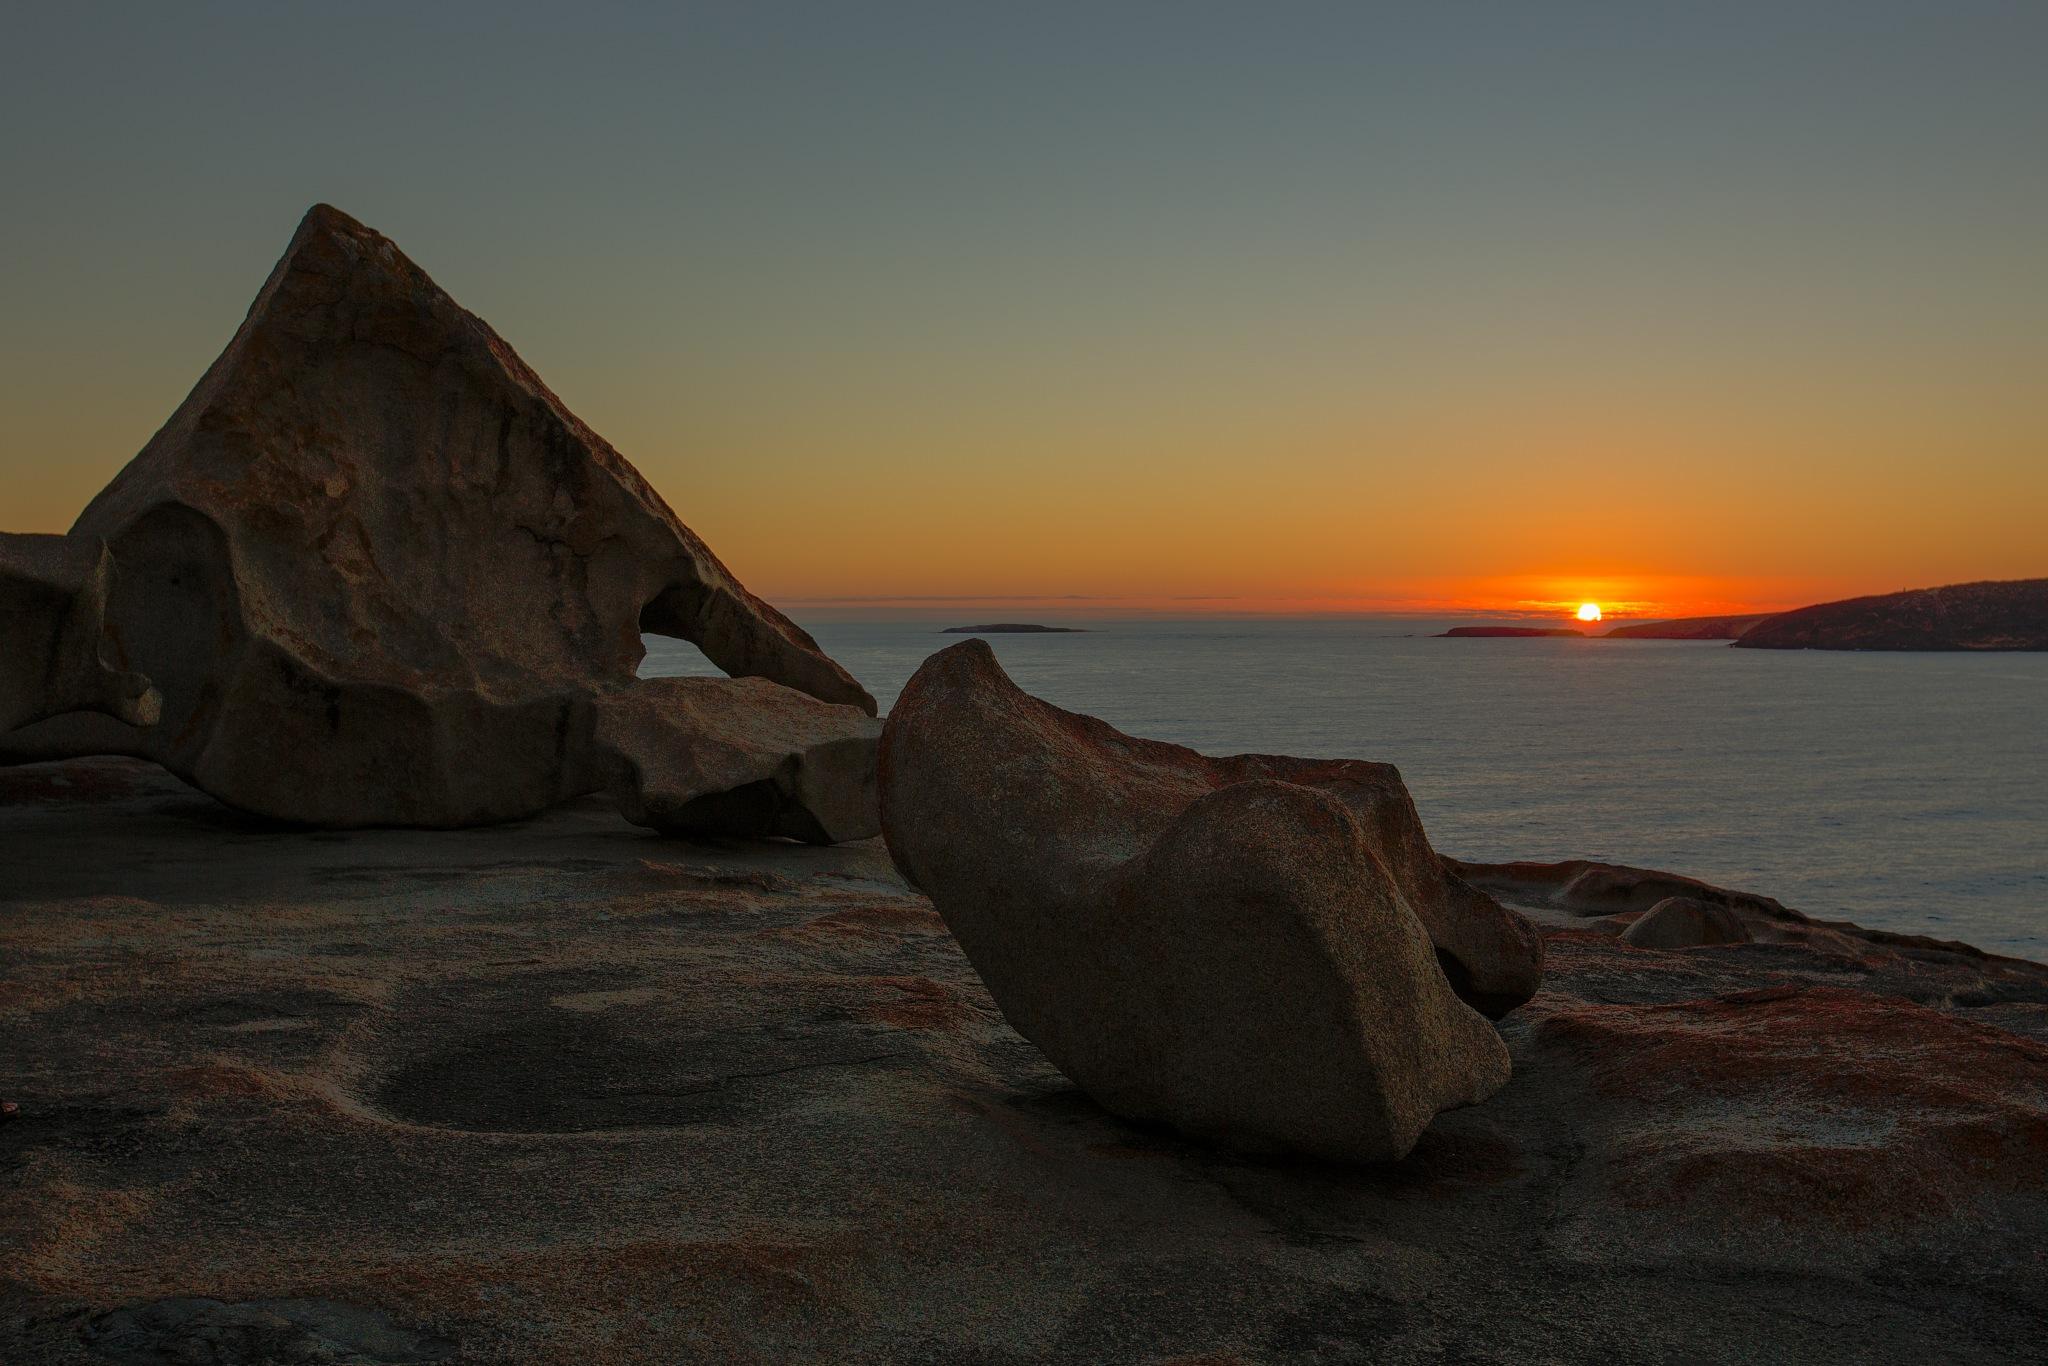 Red Rocks by iKon